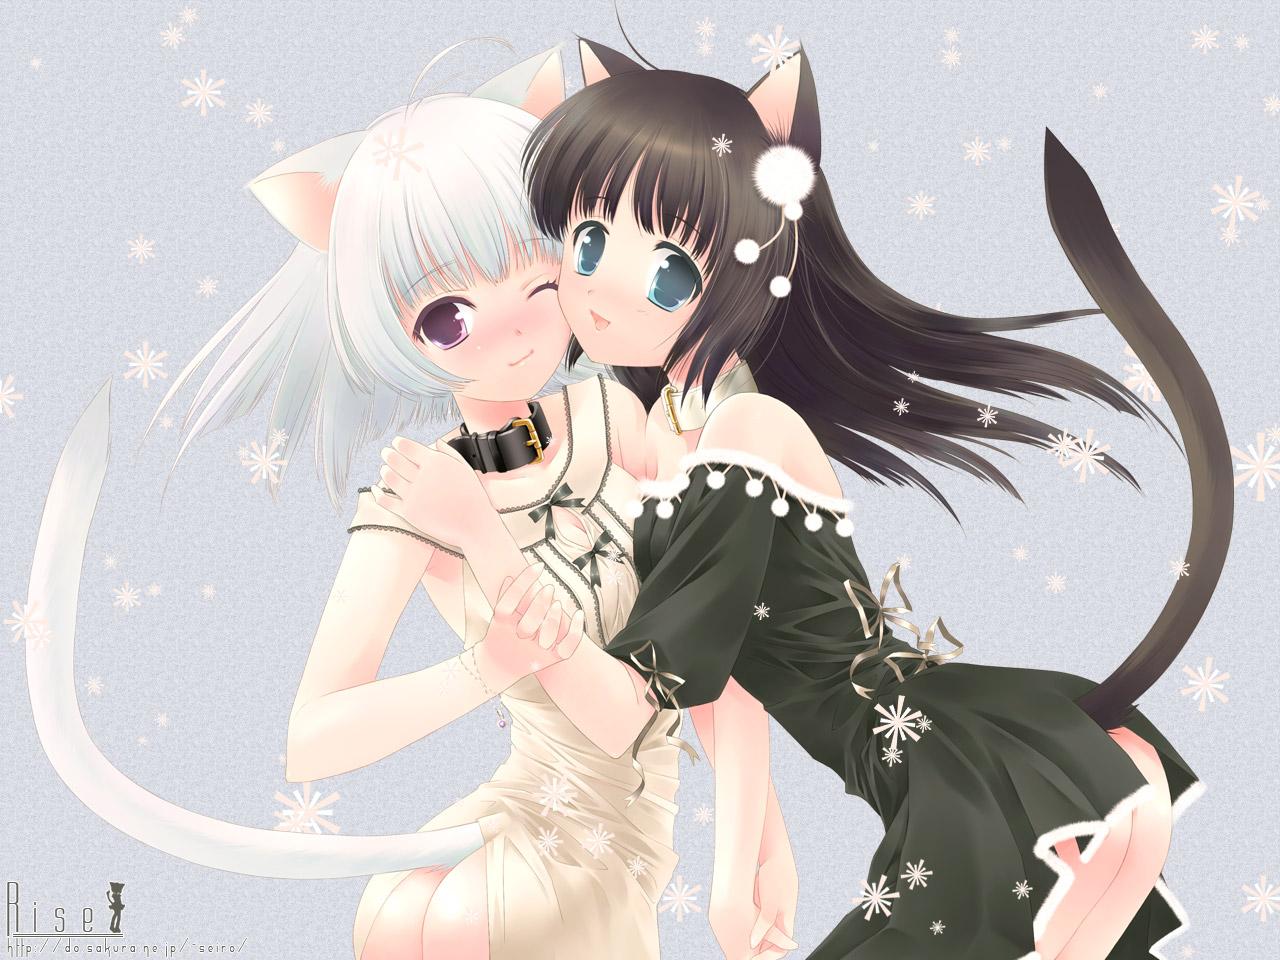 animal_ears ass black_hair blue_eyes catgirl collar purple_eyes ribbons snow tail touto_seiro white_hair